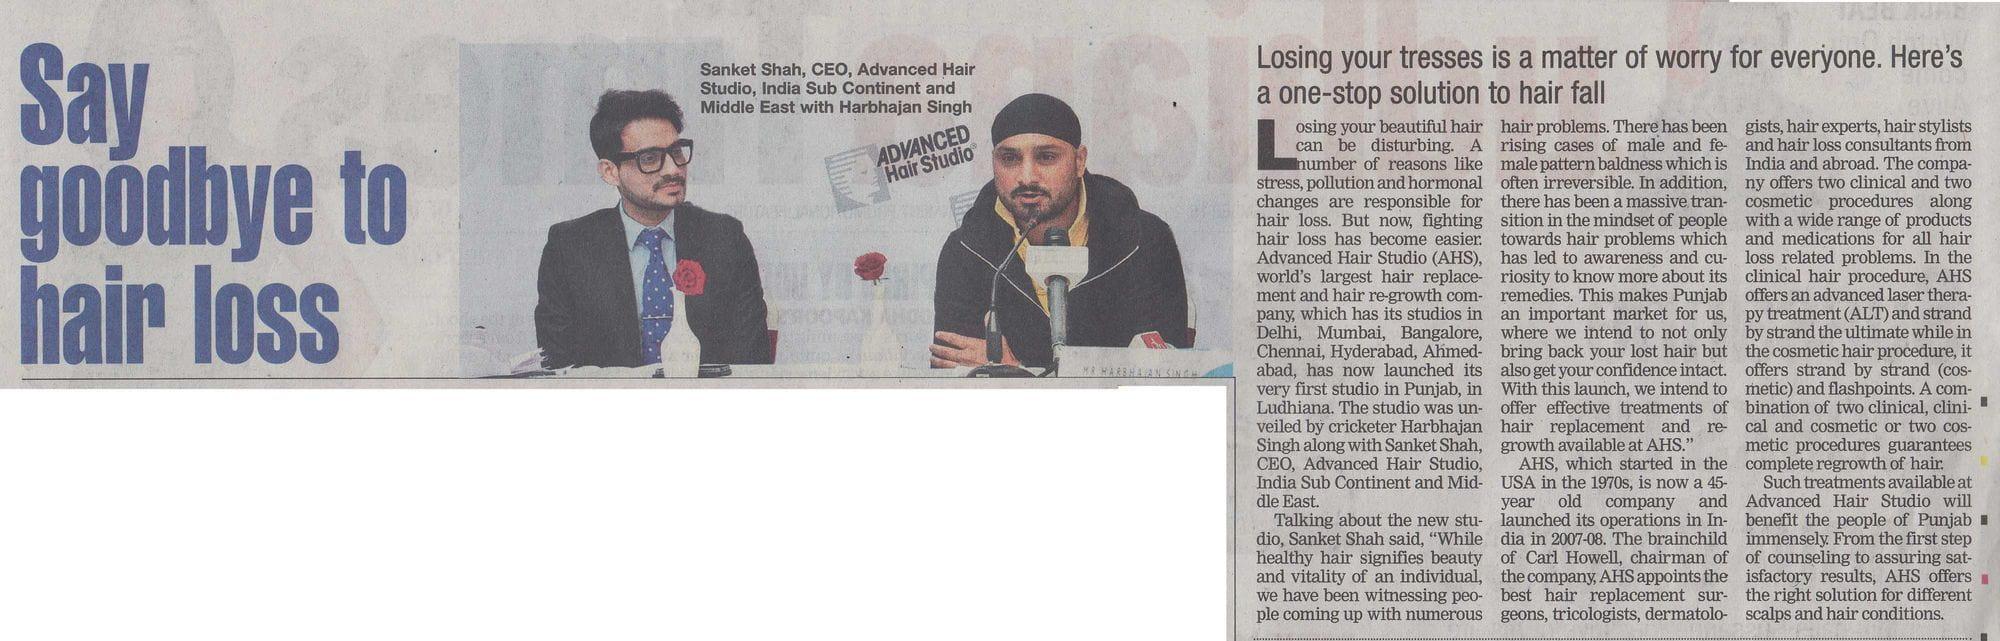 Times Of IndiaLudhiana Page No 6 Dec 15 AHS Ludhiana